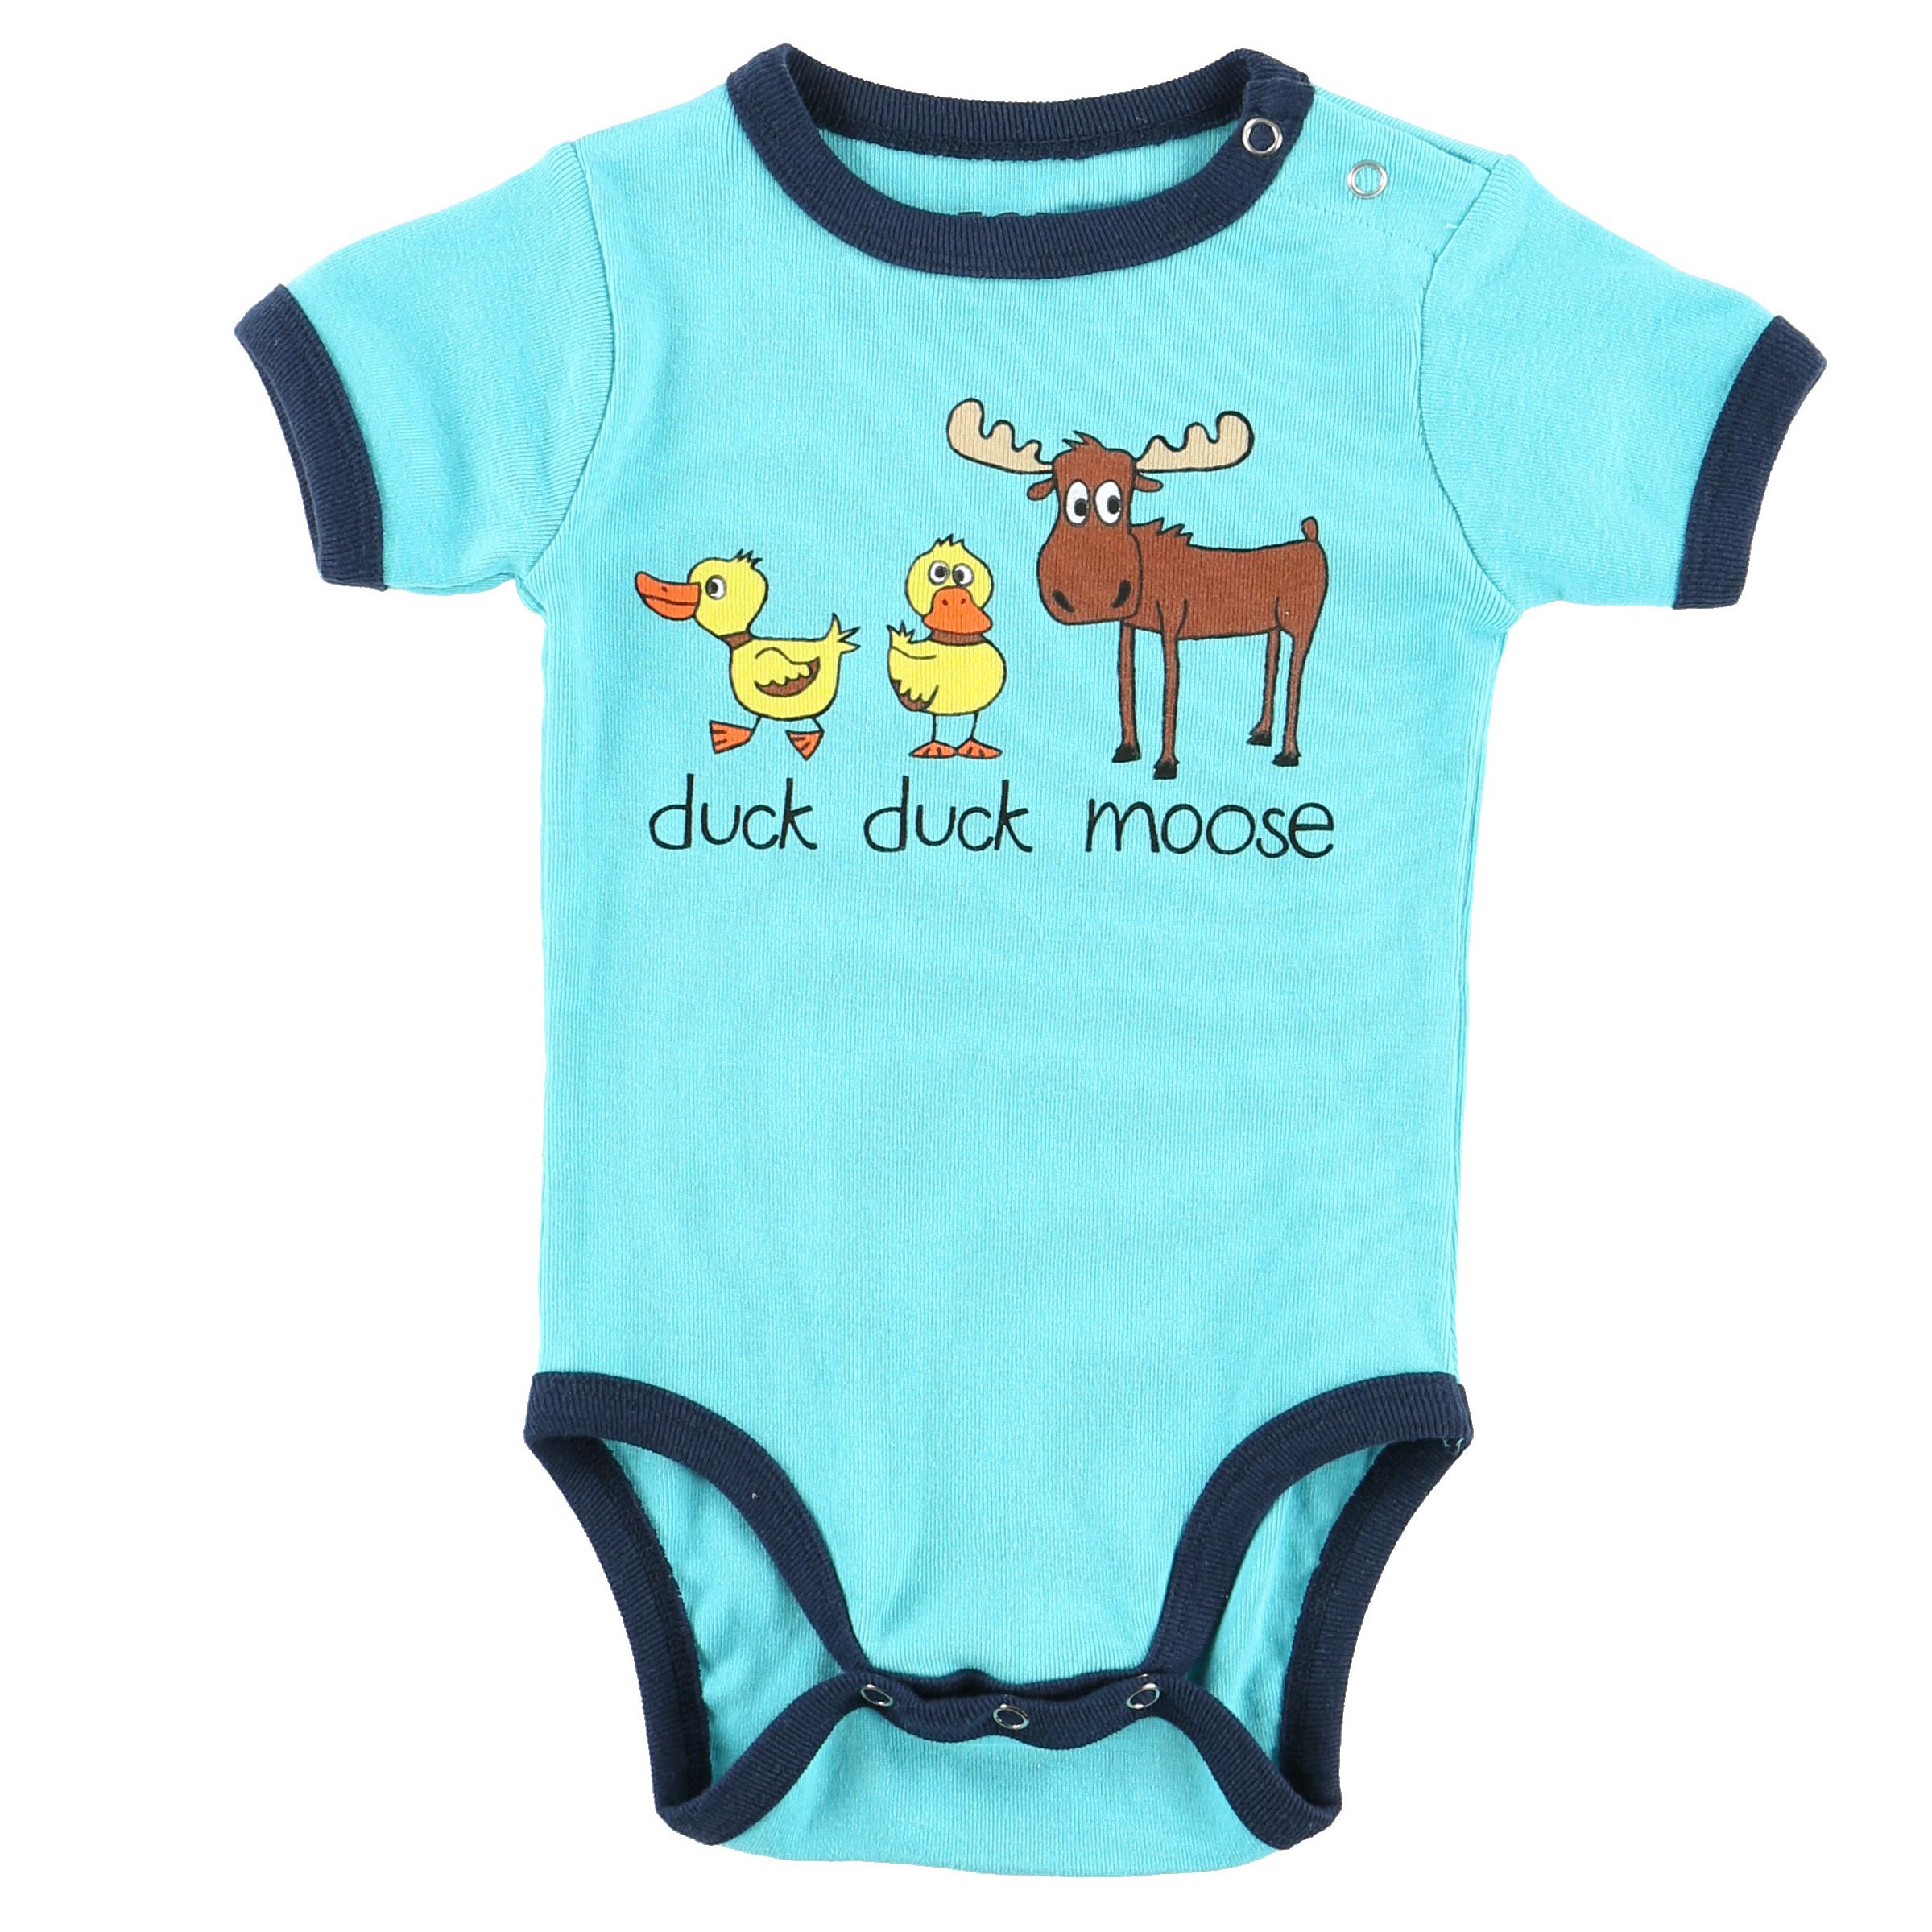 and Beanie Hat for Infant Girls Equestrian Bodysuit Set Barn Baby Horse Gift Set Bib Onesie